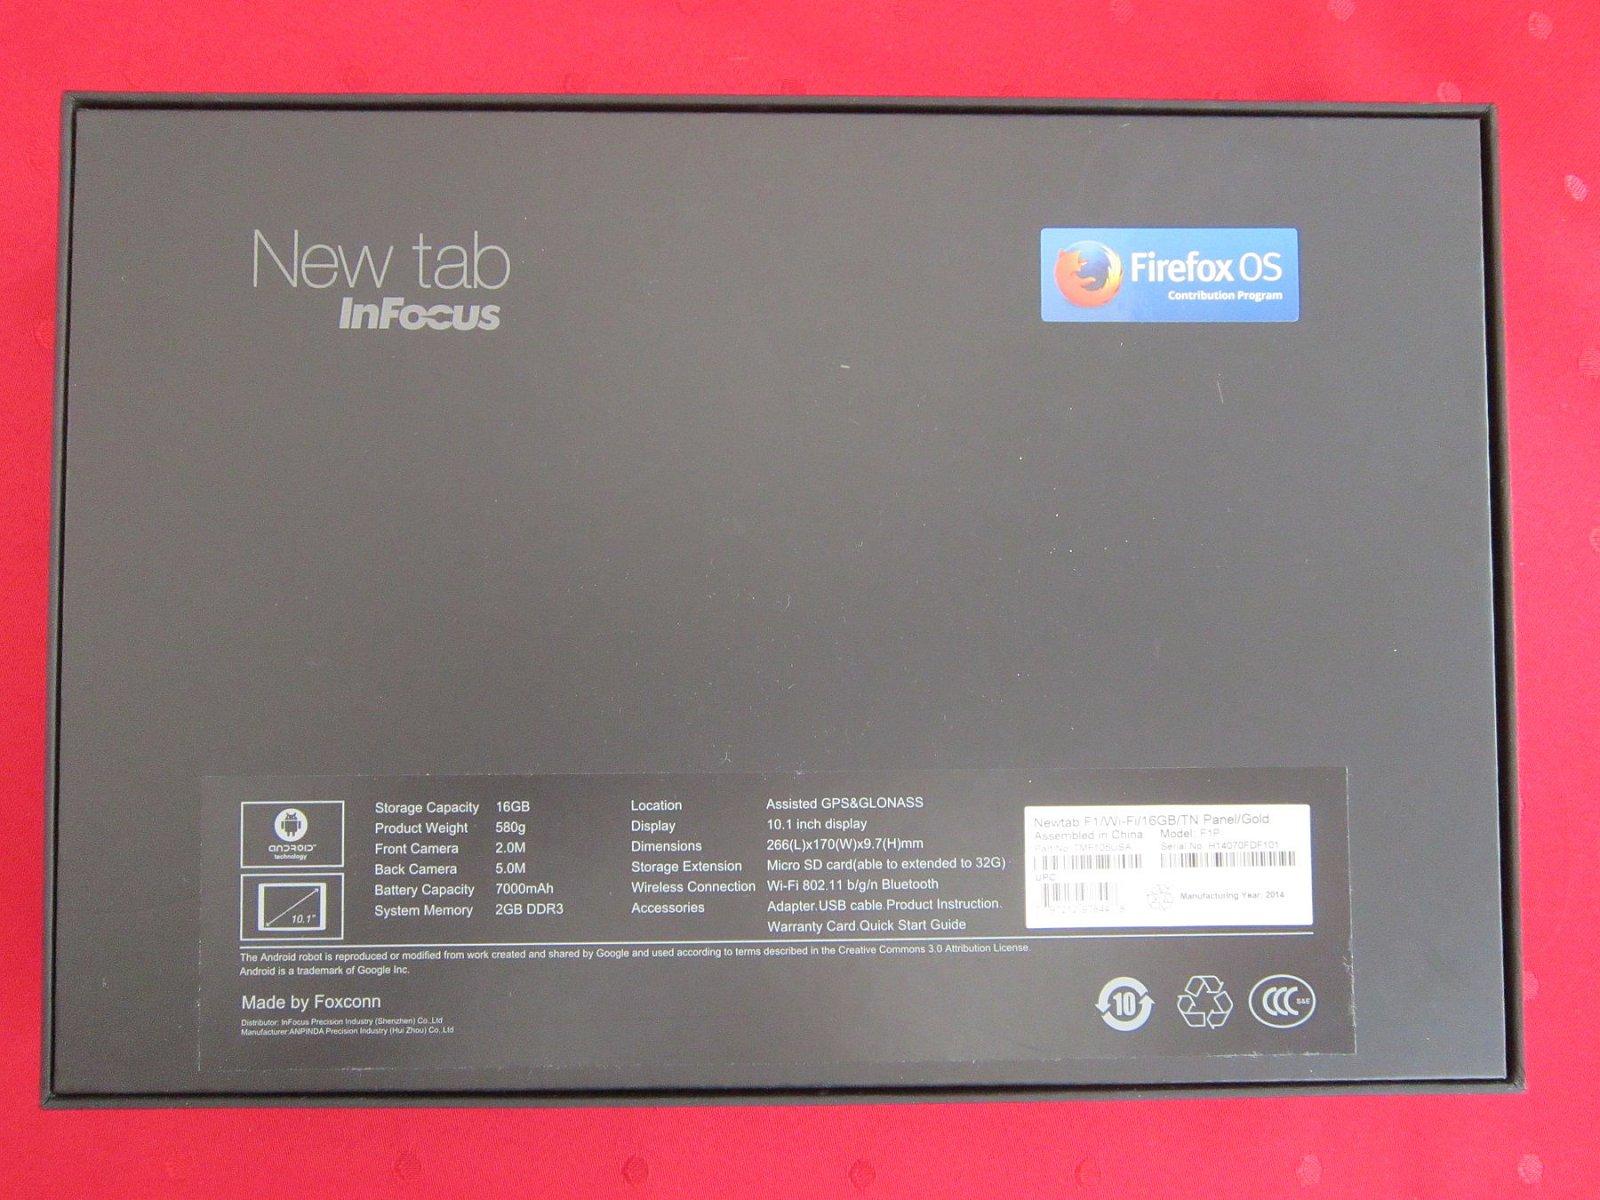 Rozbalení tabletu s Firefox OS